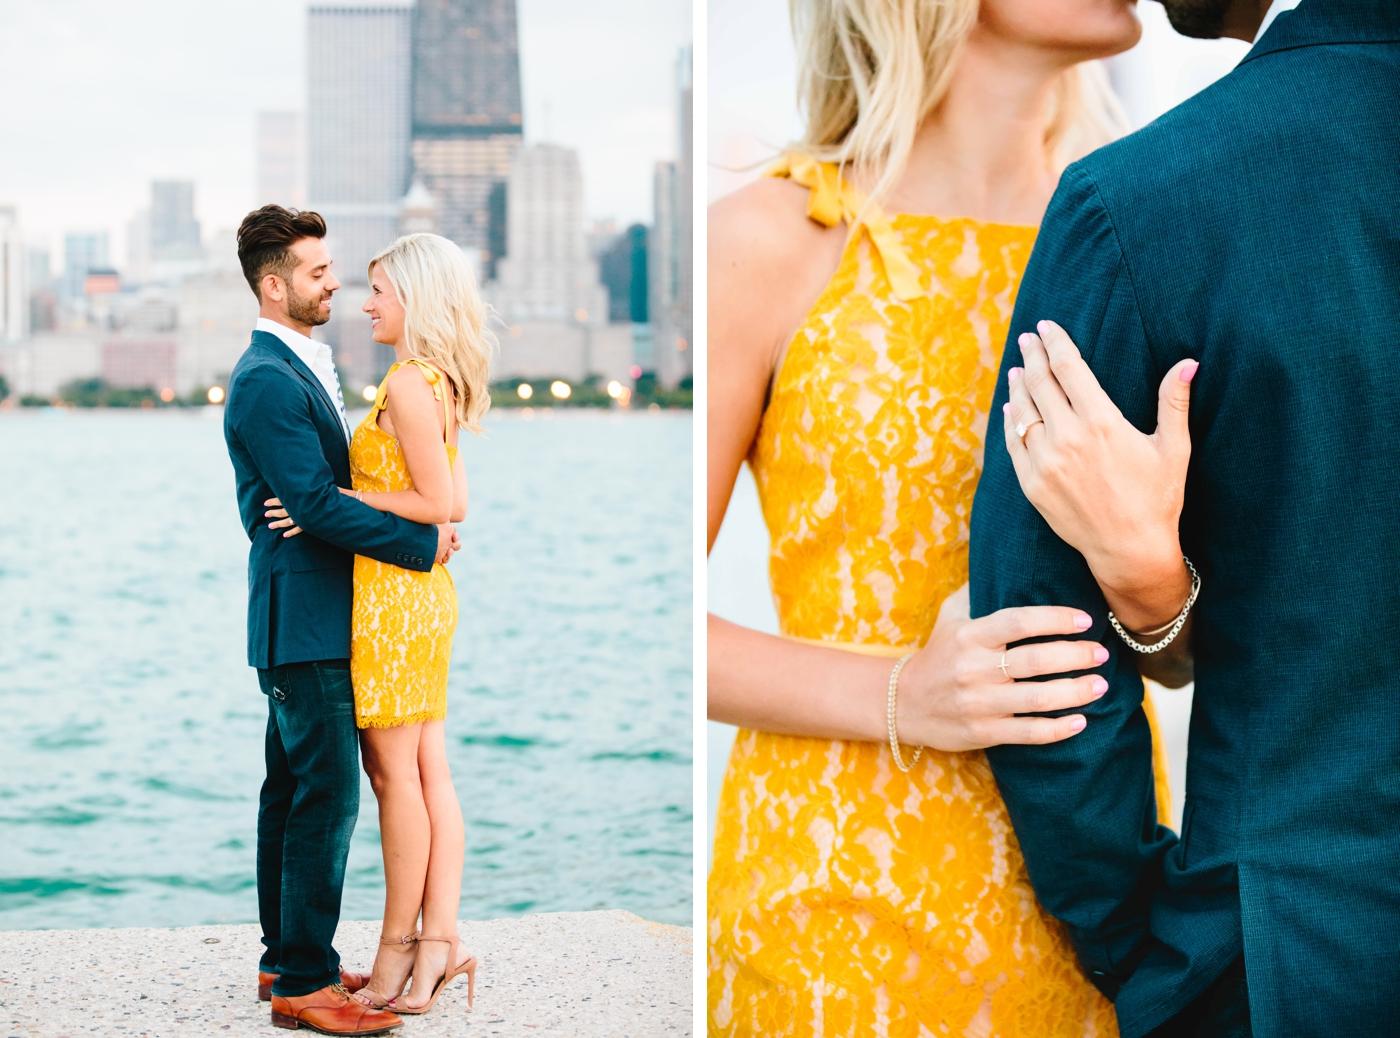 chicago-fine-art-wedding-photography-jasonbrittany18